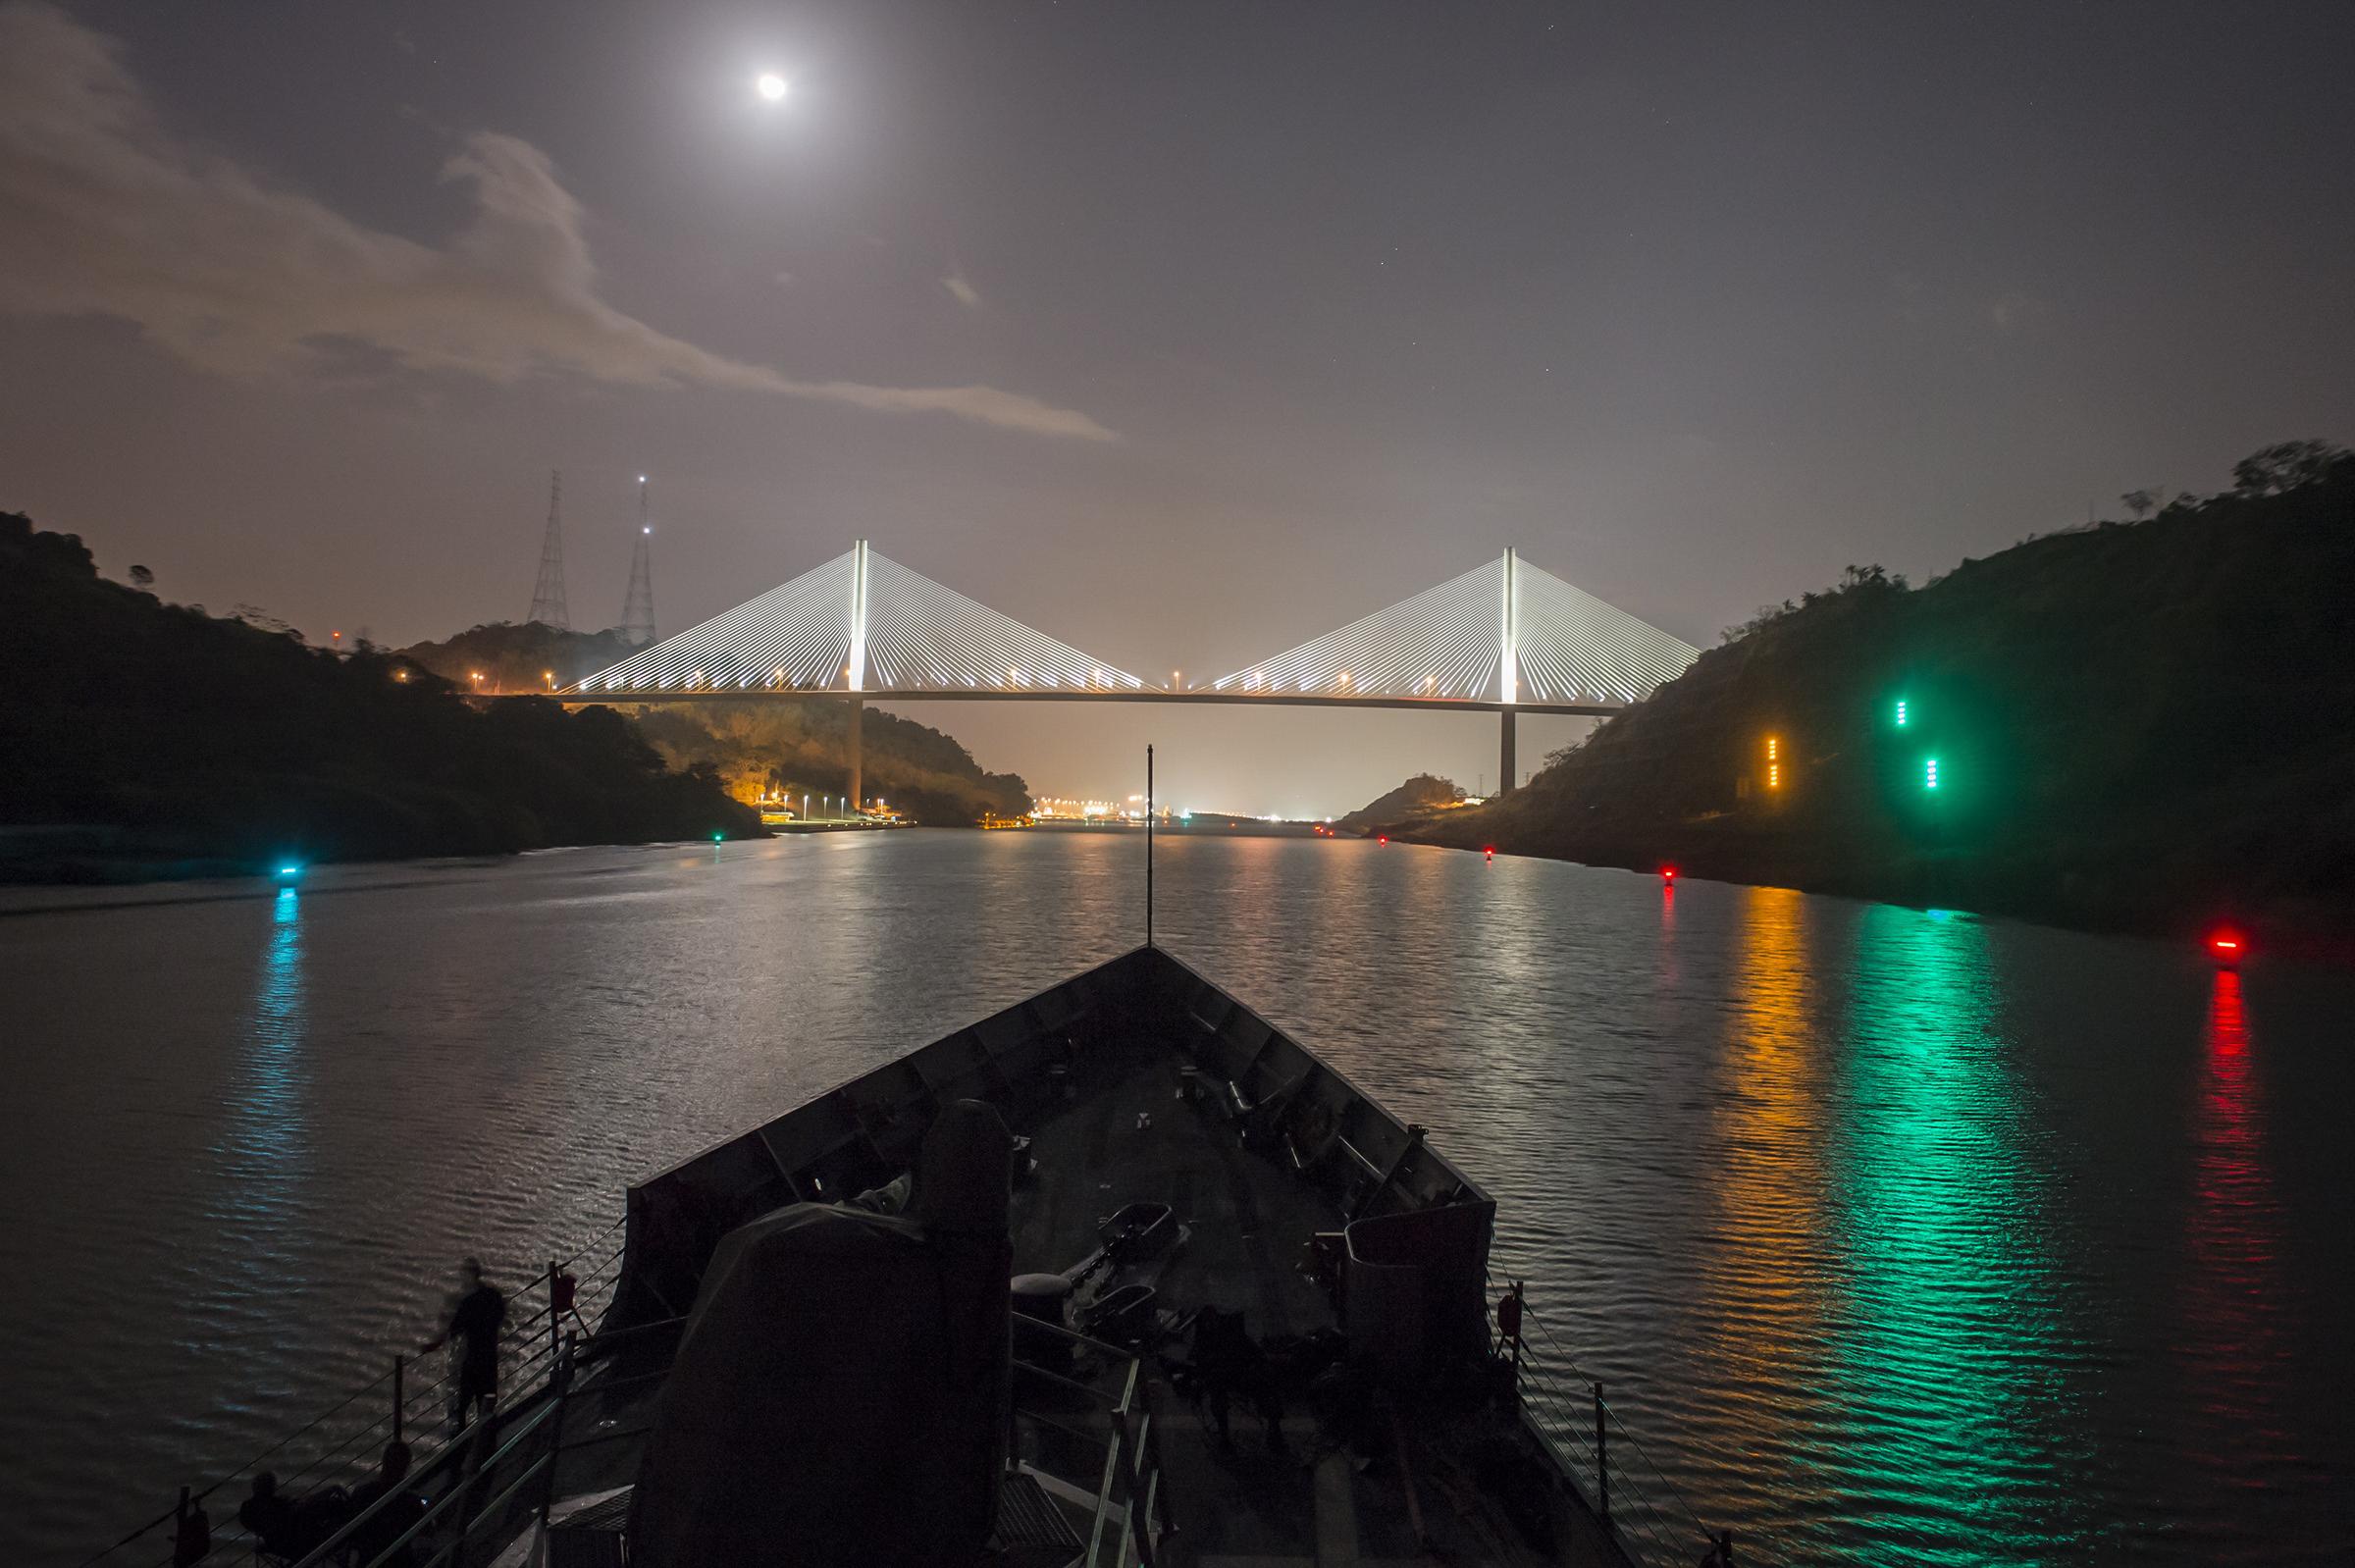 USS Kauffman (FFG-59) transits the Panama Canal on April 10, 2015. US Navy Photo